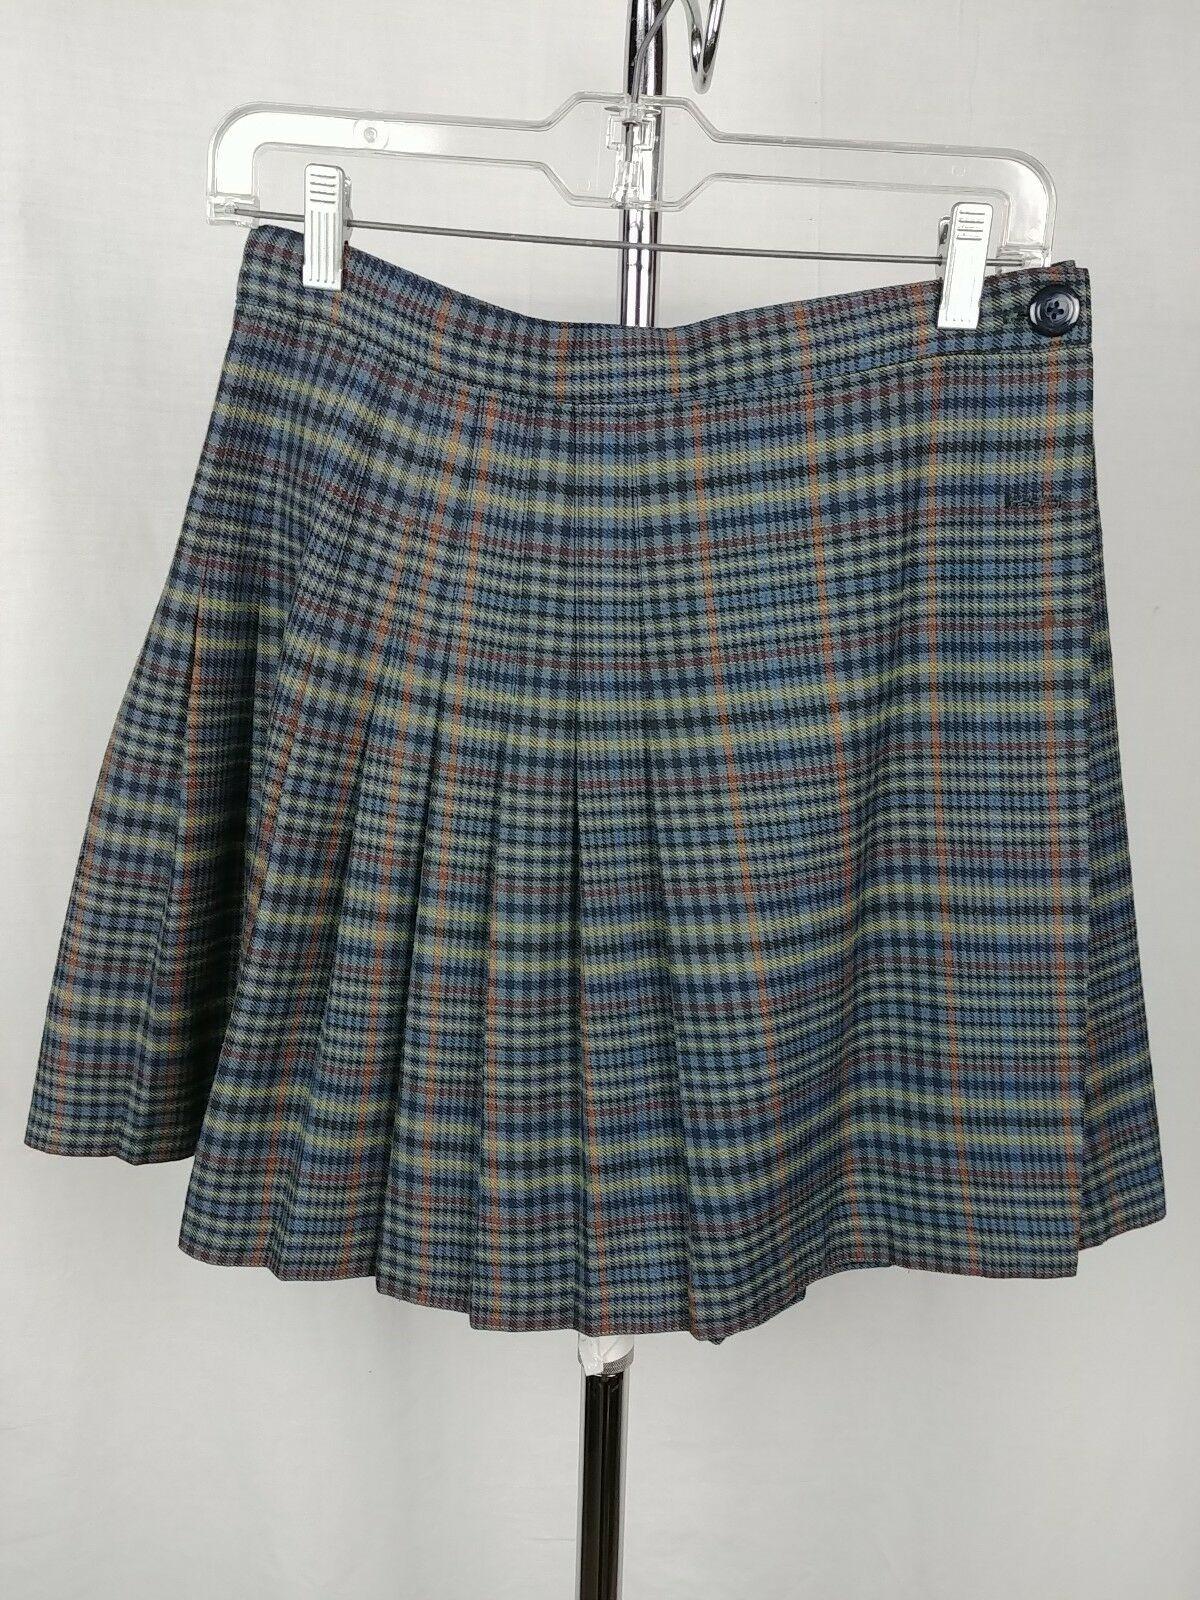 908e5a195 Tracy Evans Blue Plaid School Girl Short Pleated Skirt Womens Size 9